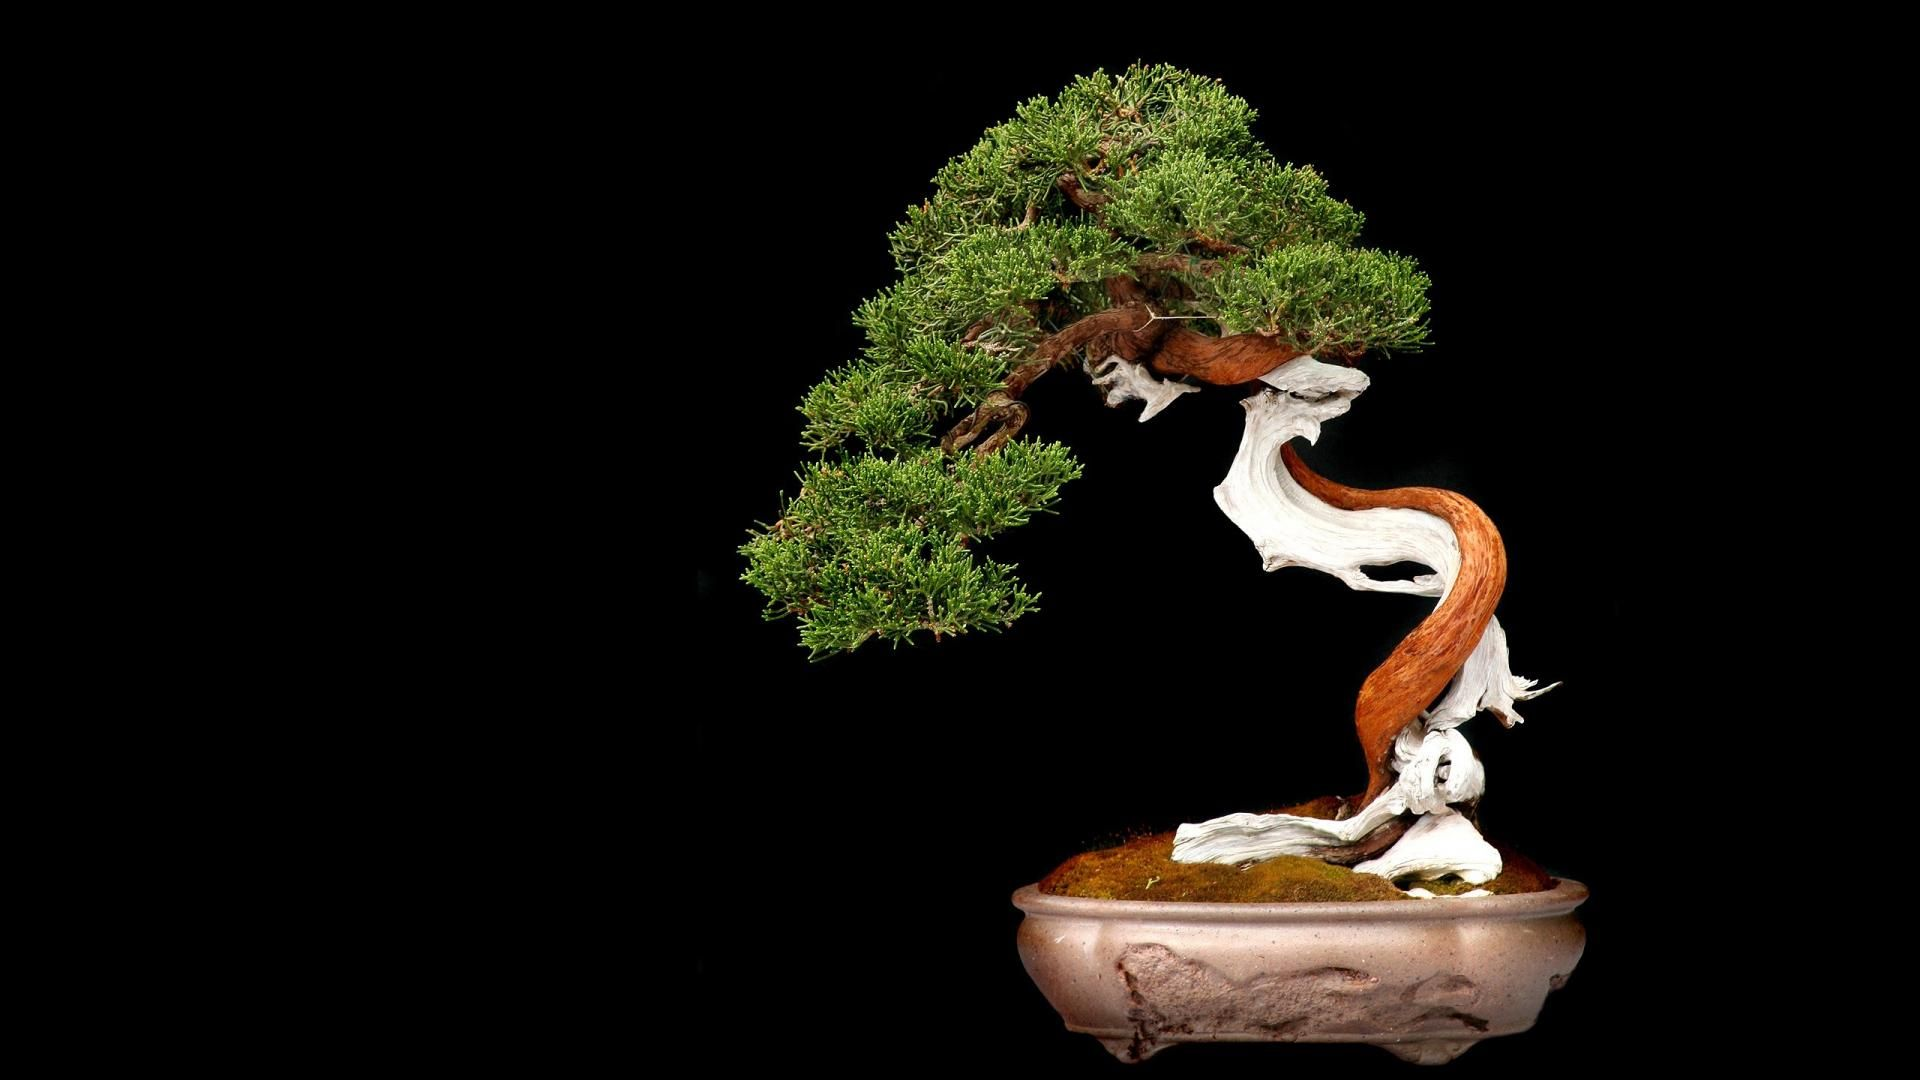 Bonsai Wallpaper Japanese Bonsai Tree Japanese Bonsai Bonsai Tree